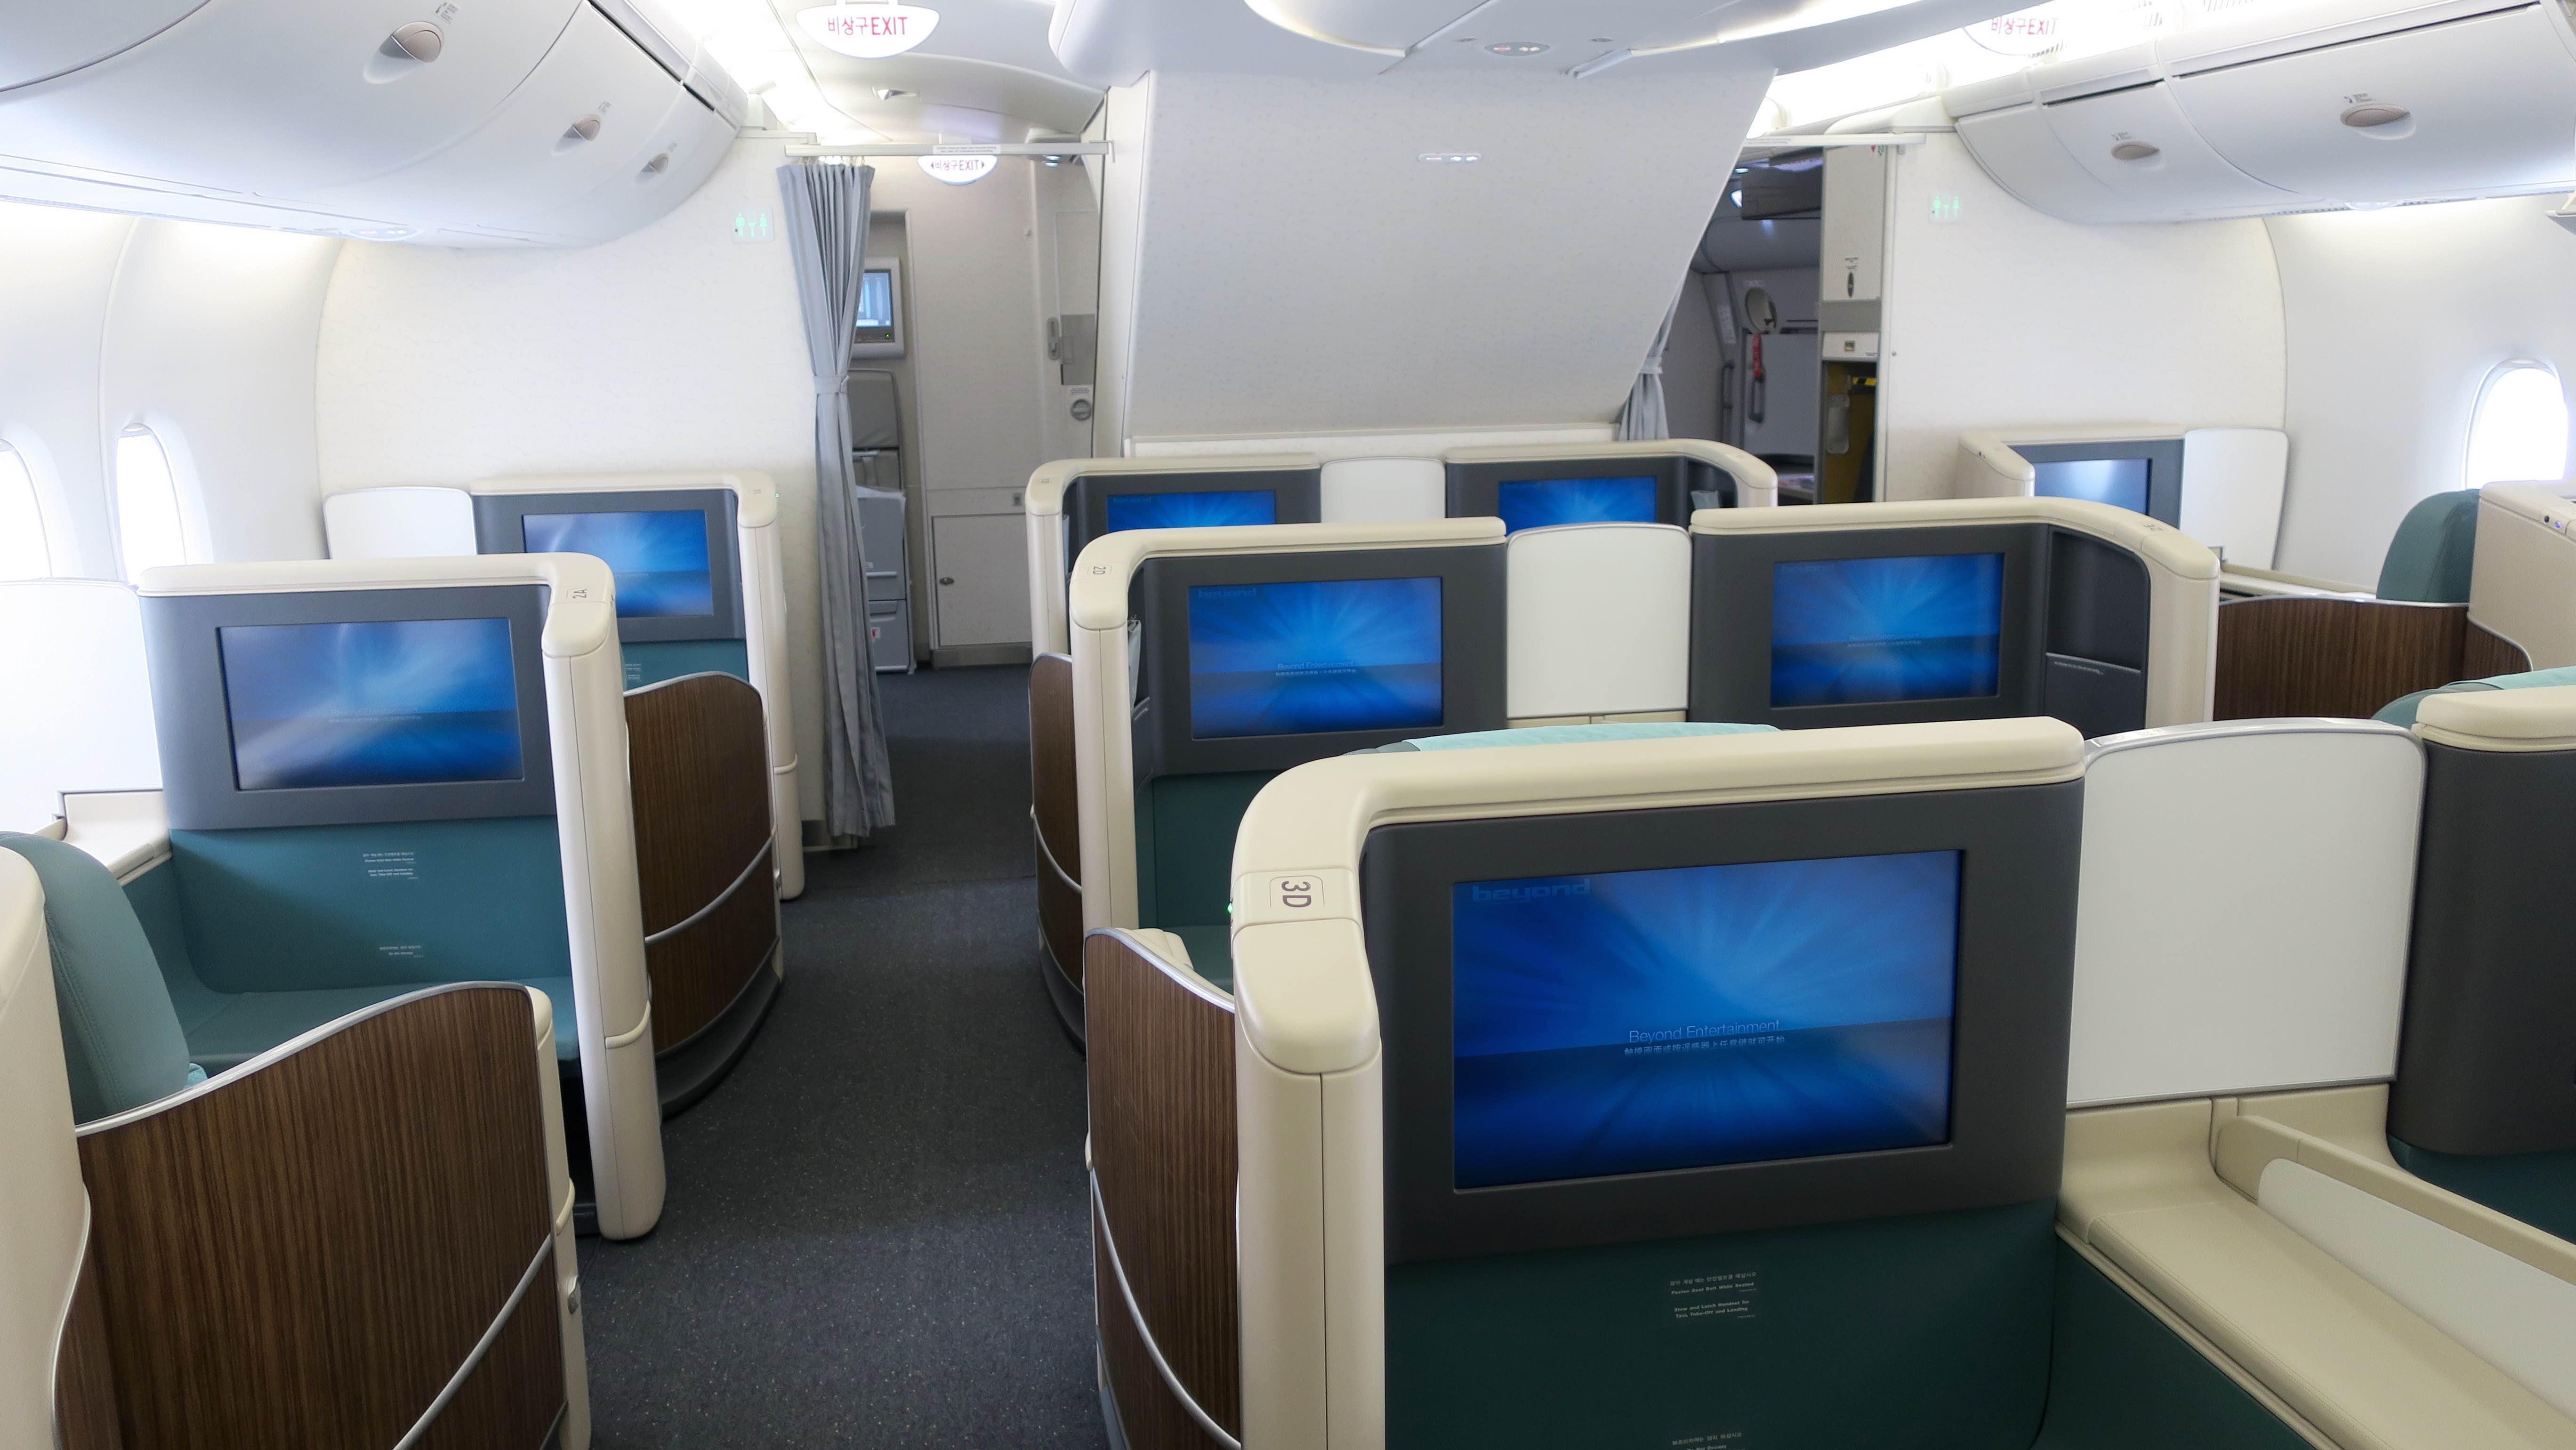 Korean Air A380 First Class overview | Point Hacks